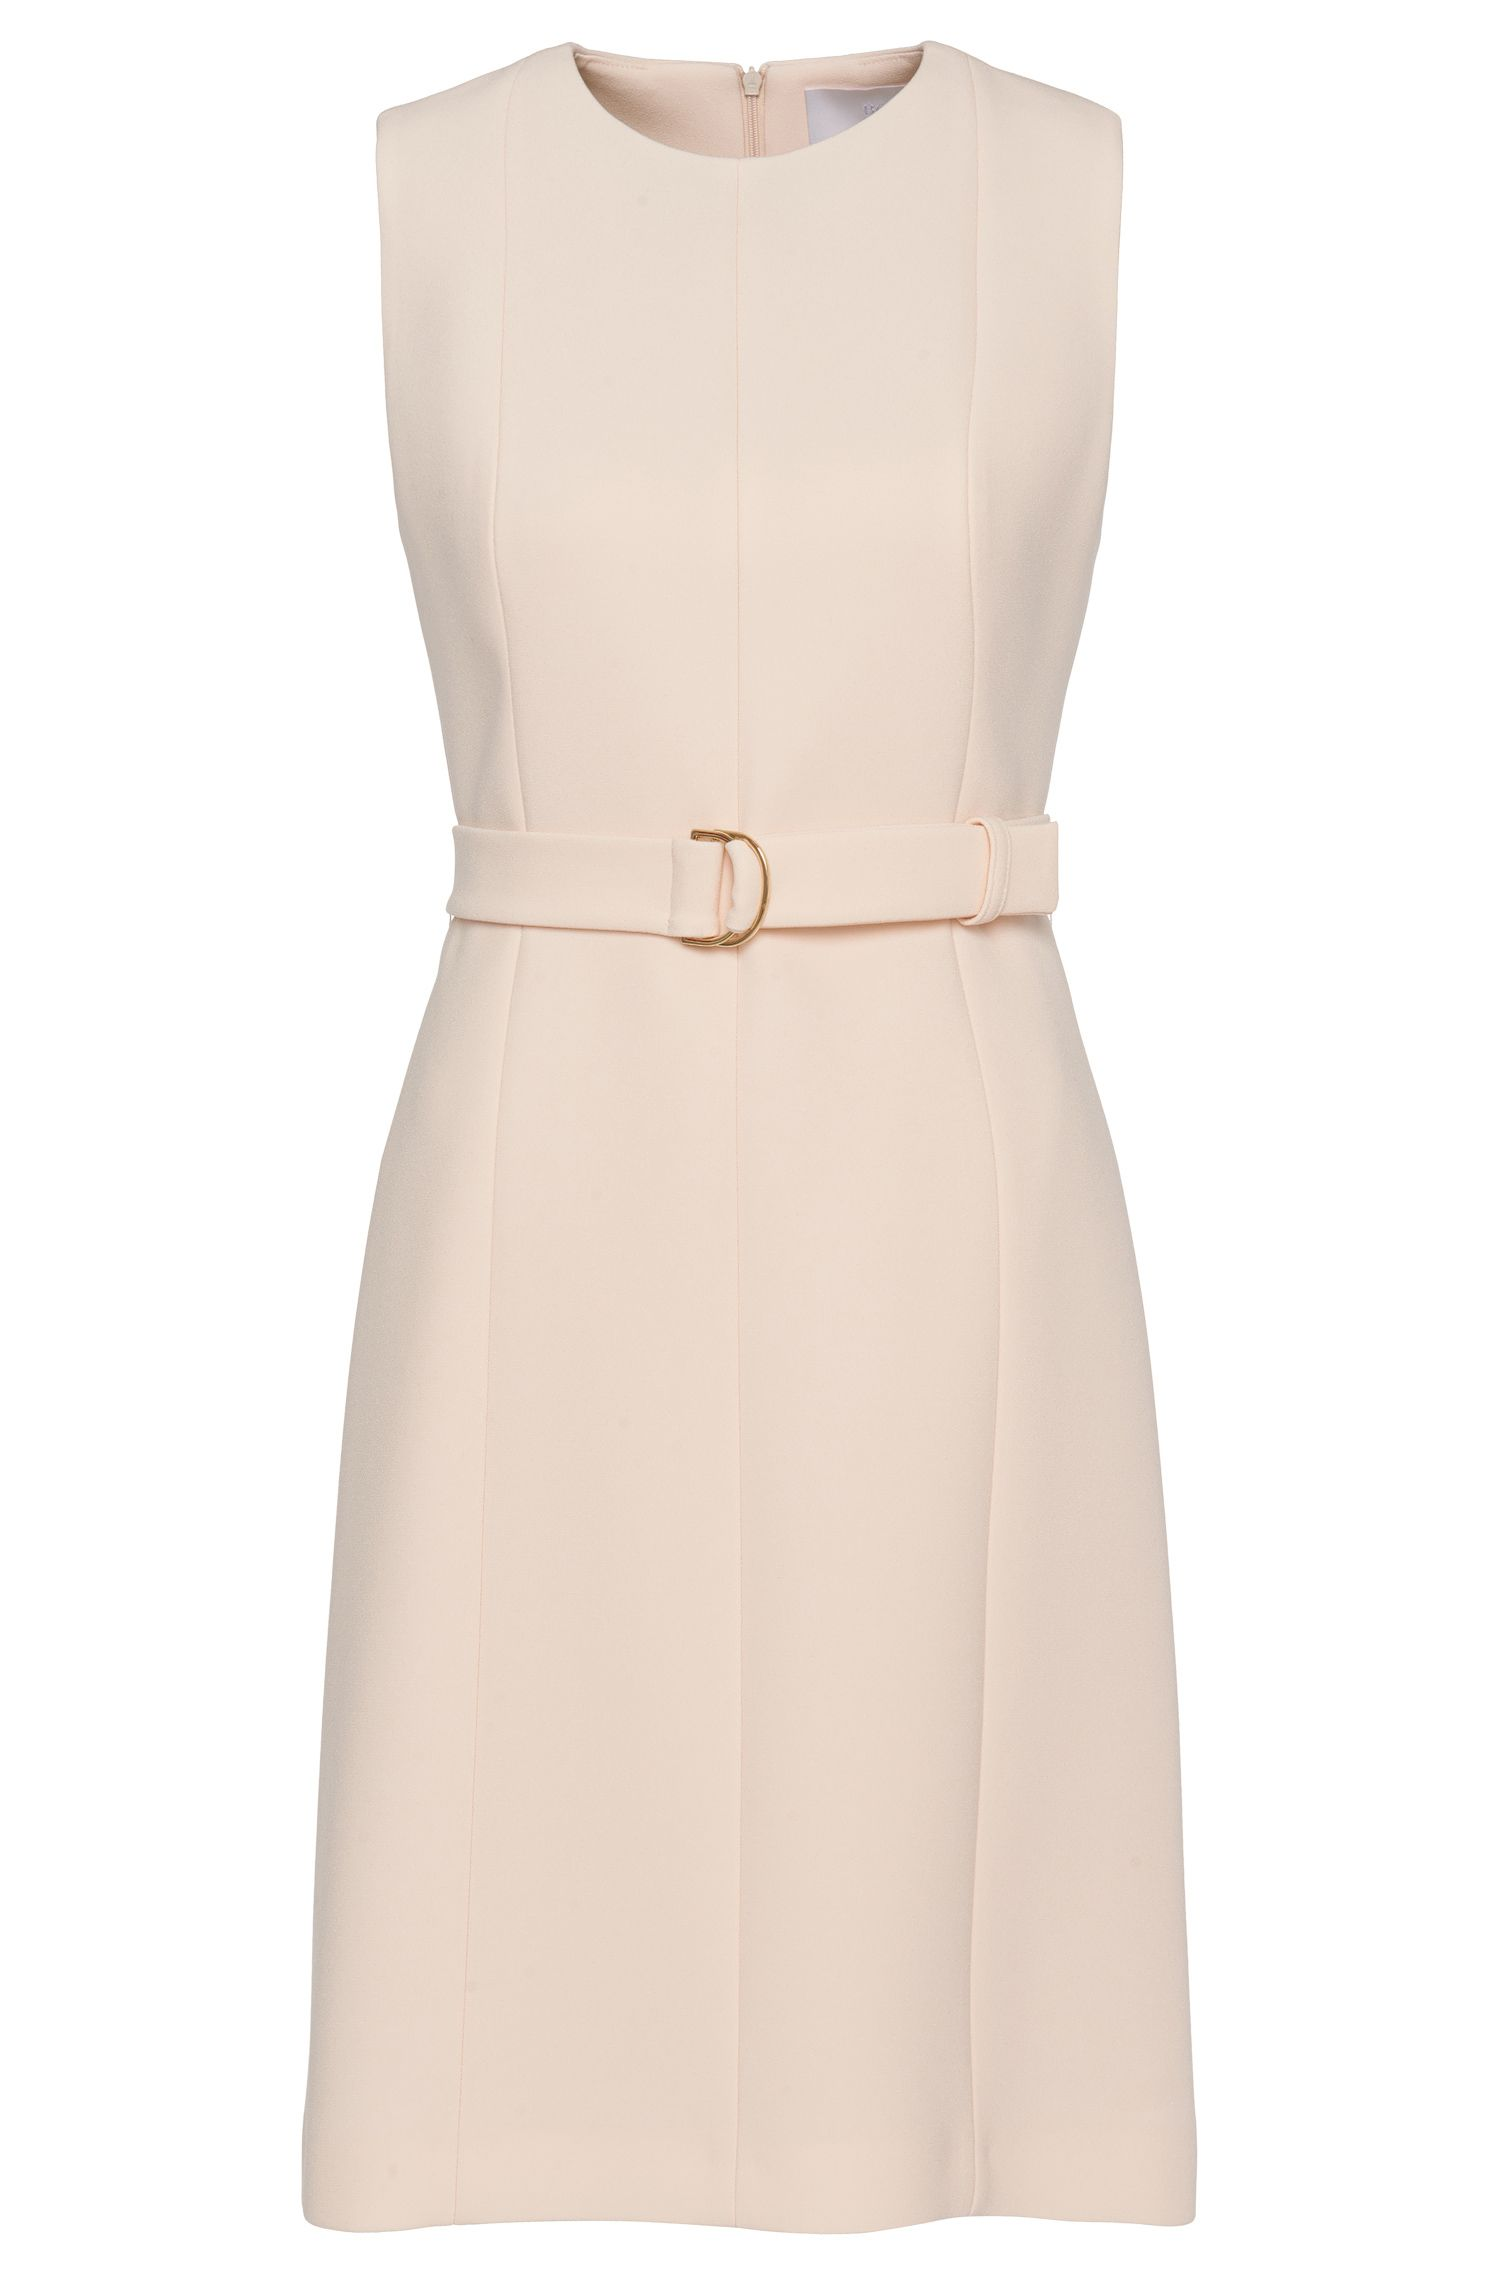 'Diganira' | Crepe Belted A-Line Dress